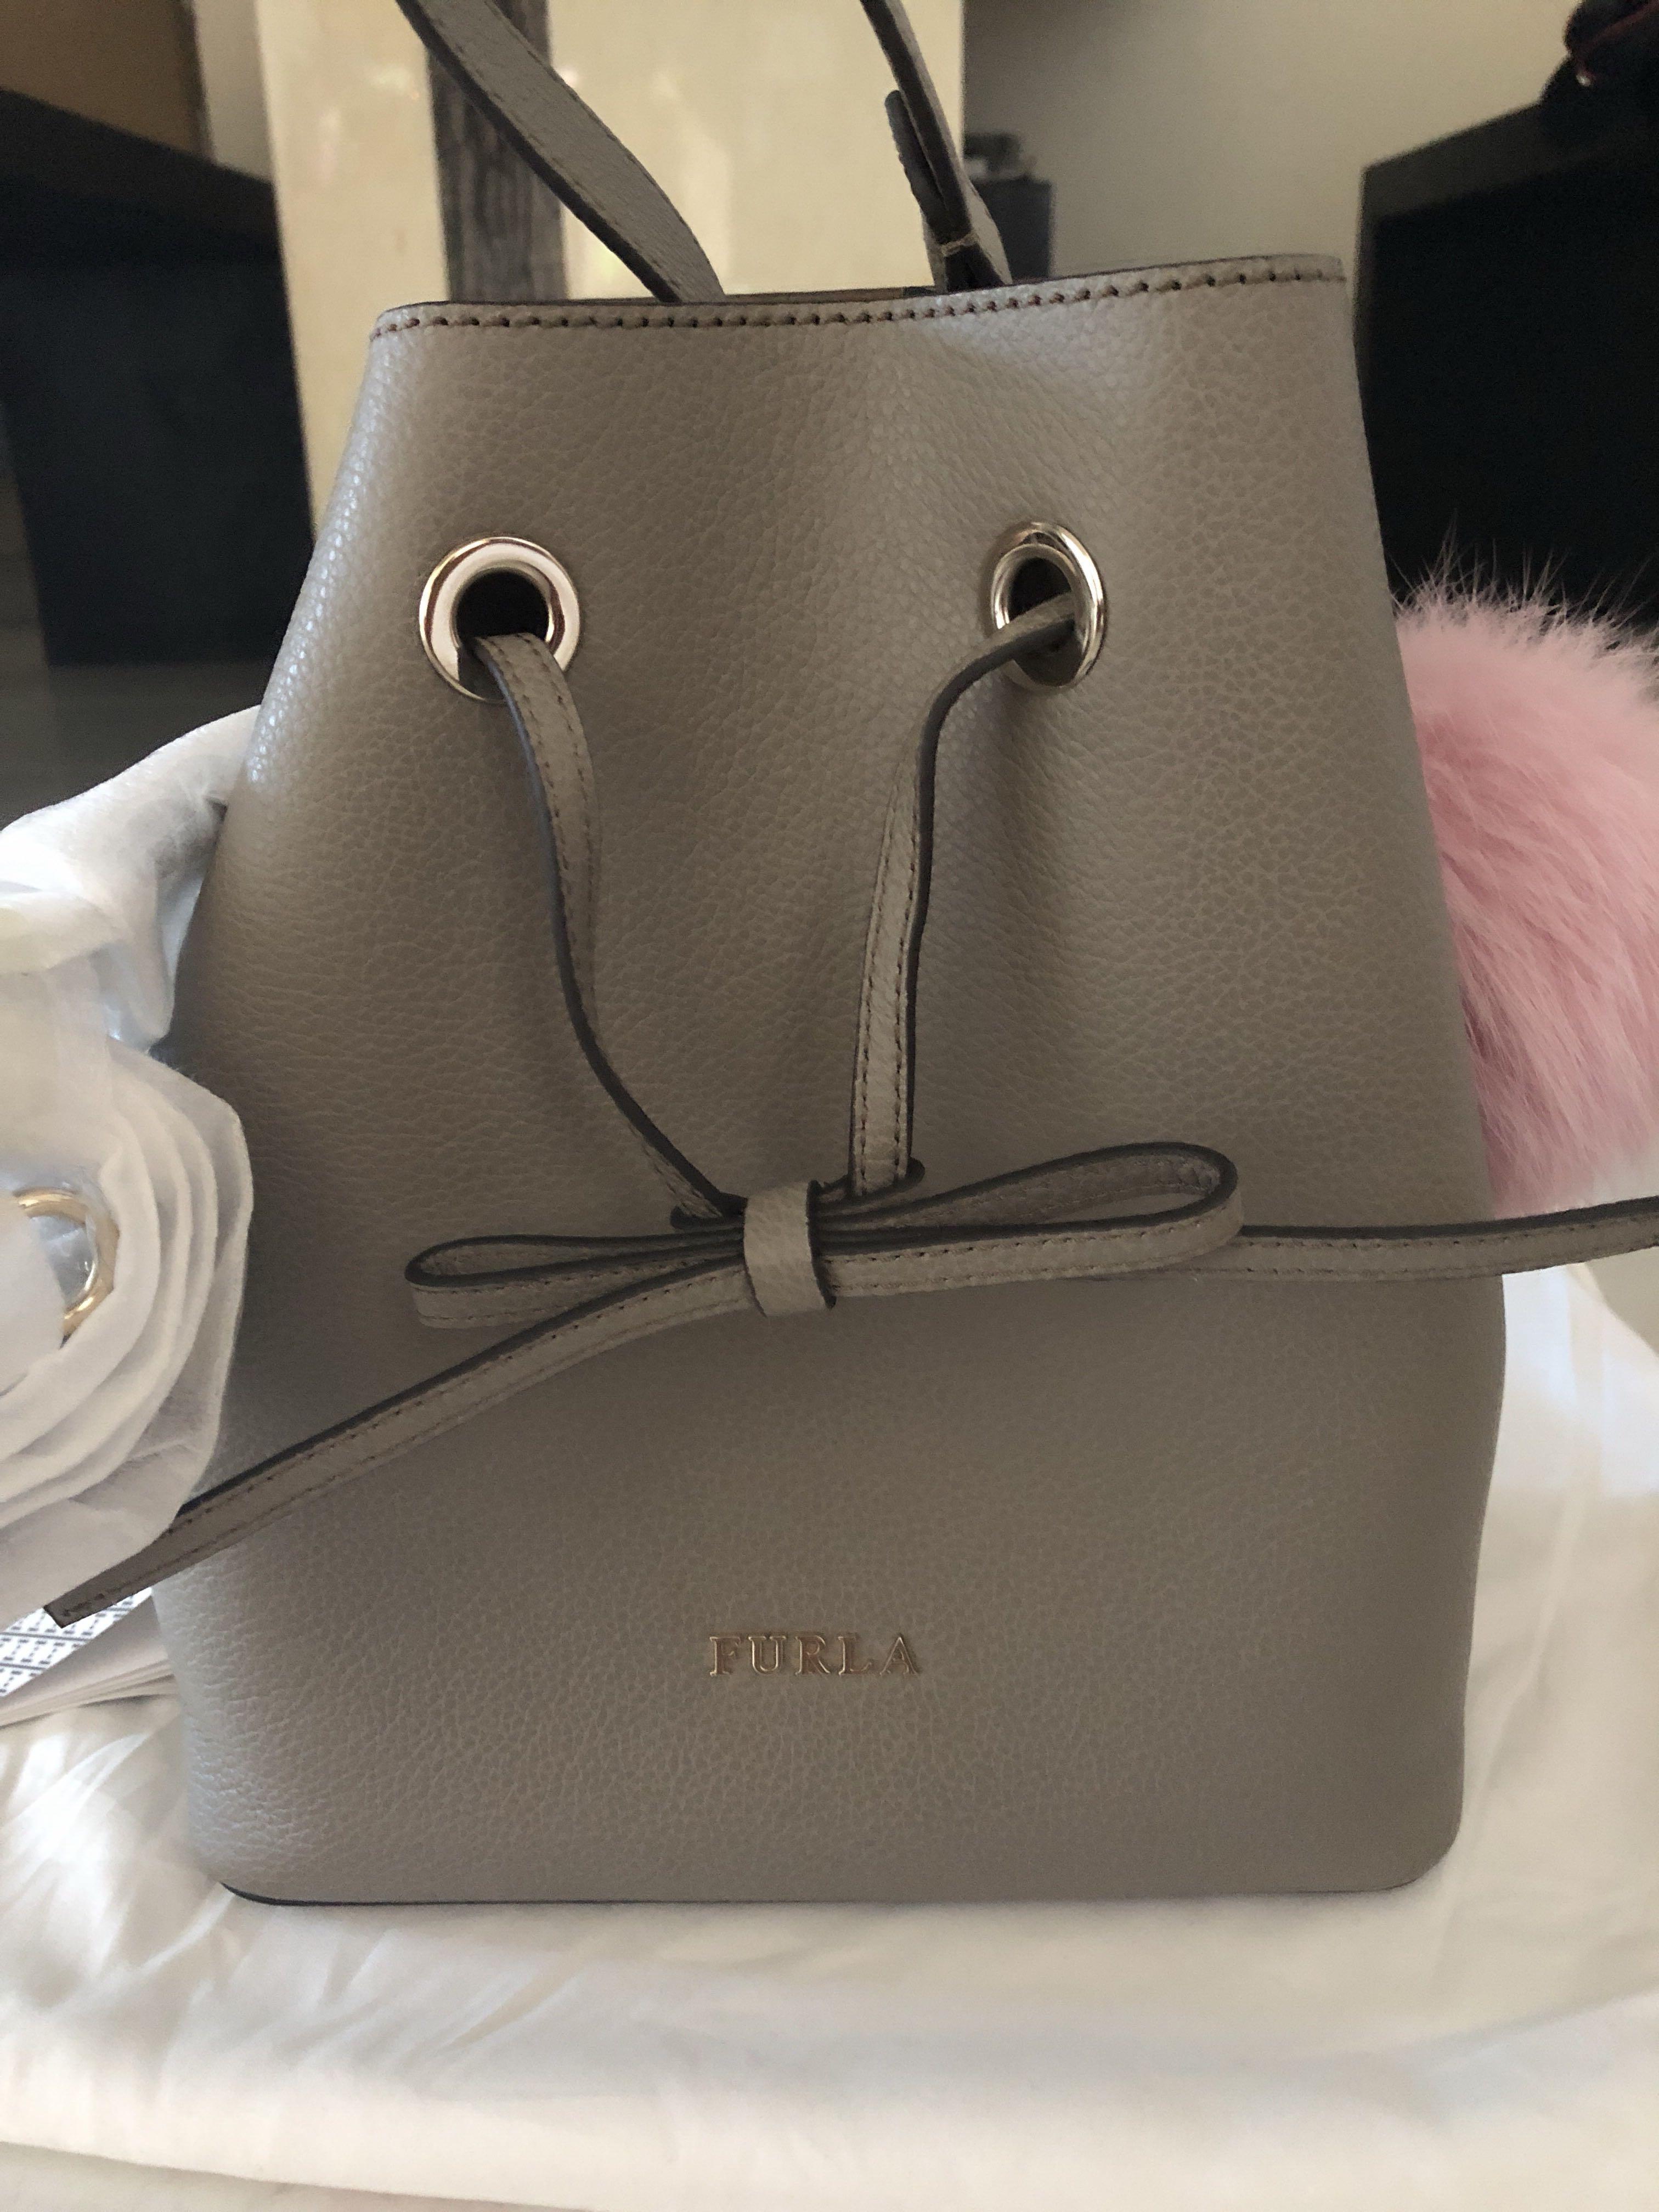 Brand new Furla Grey Bucket Sling Bag